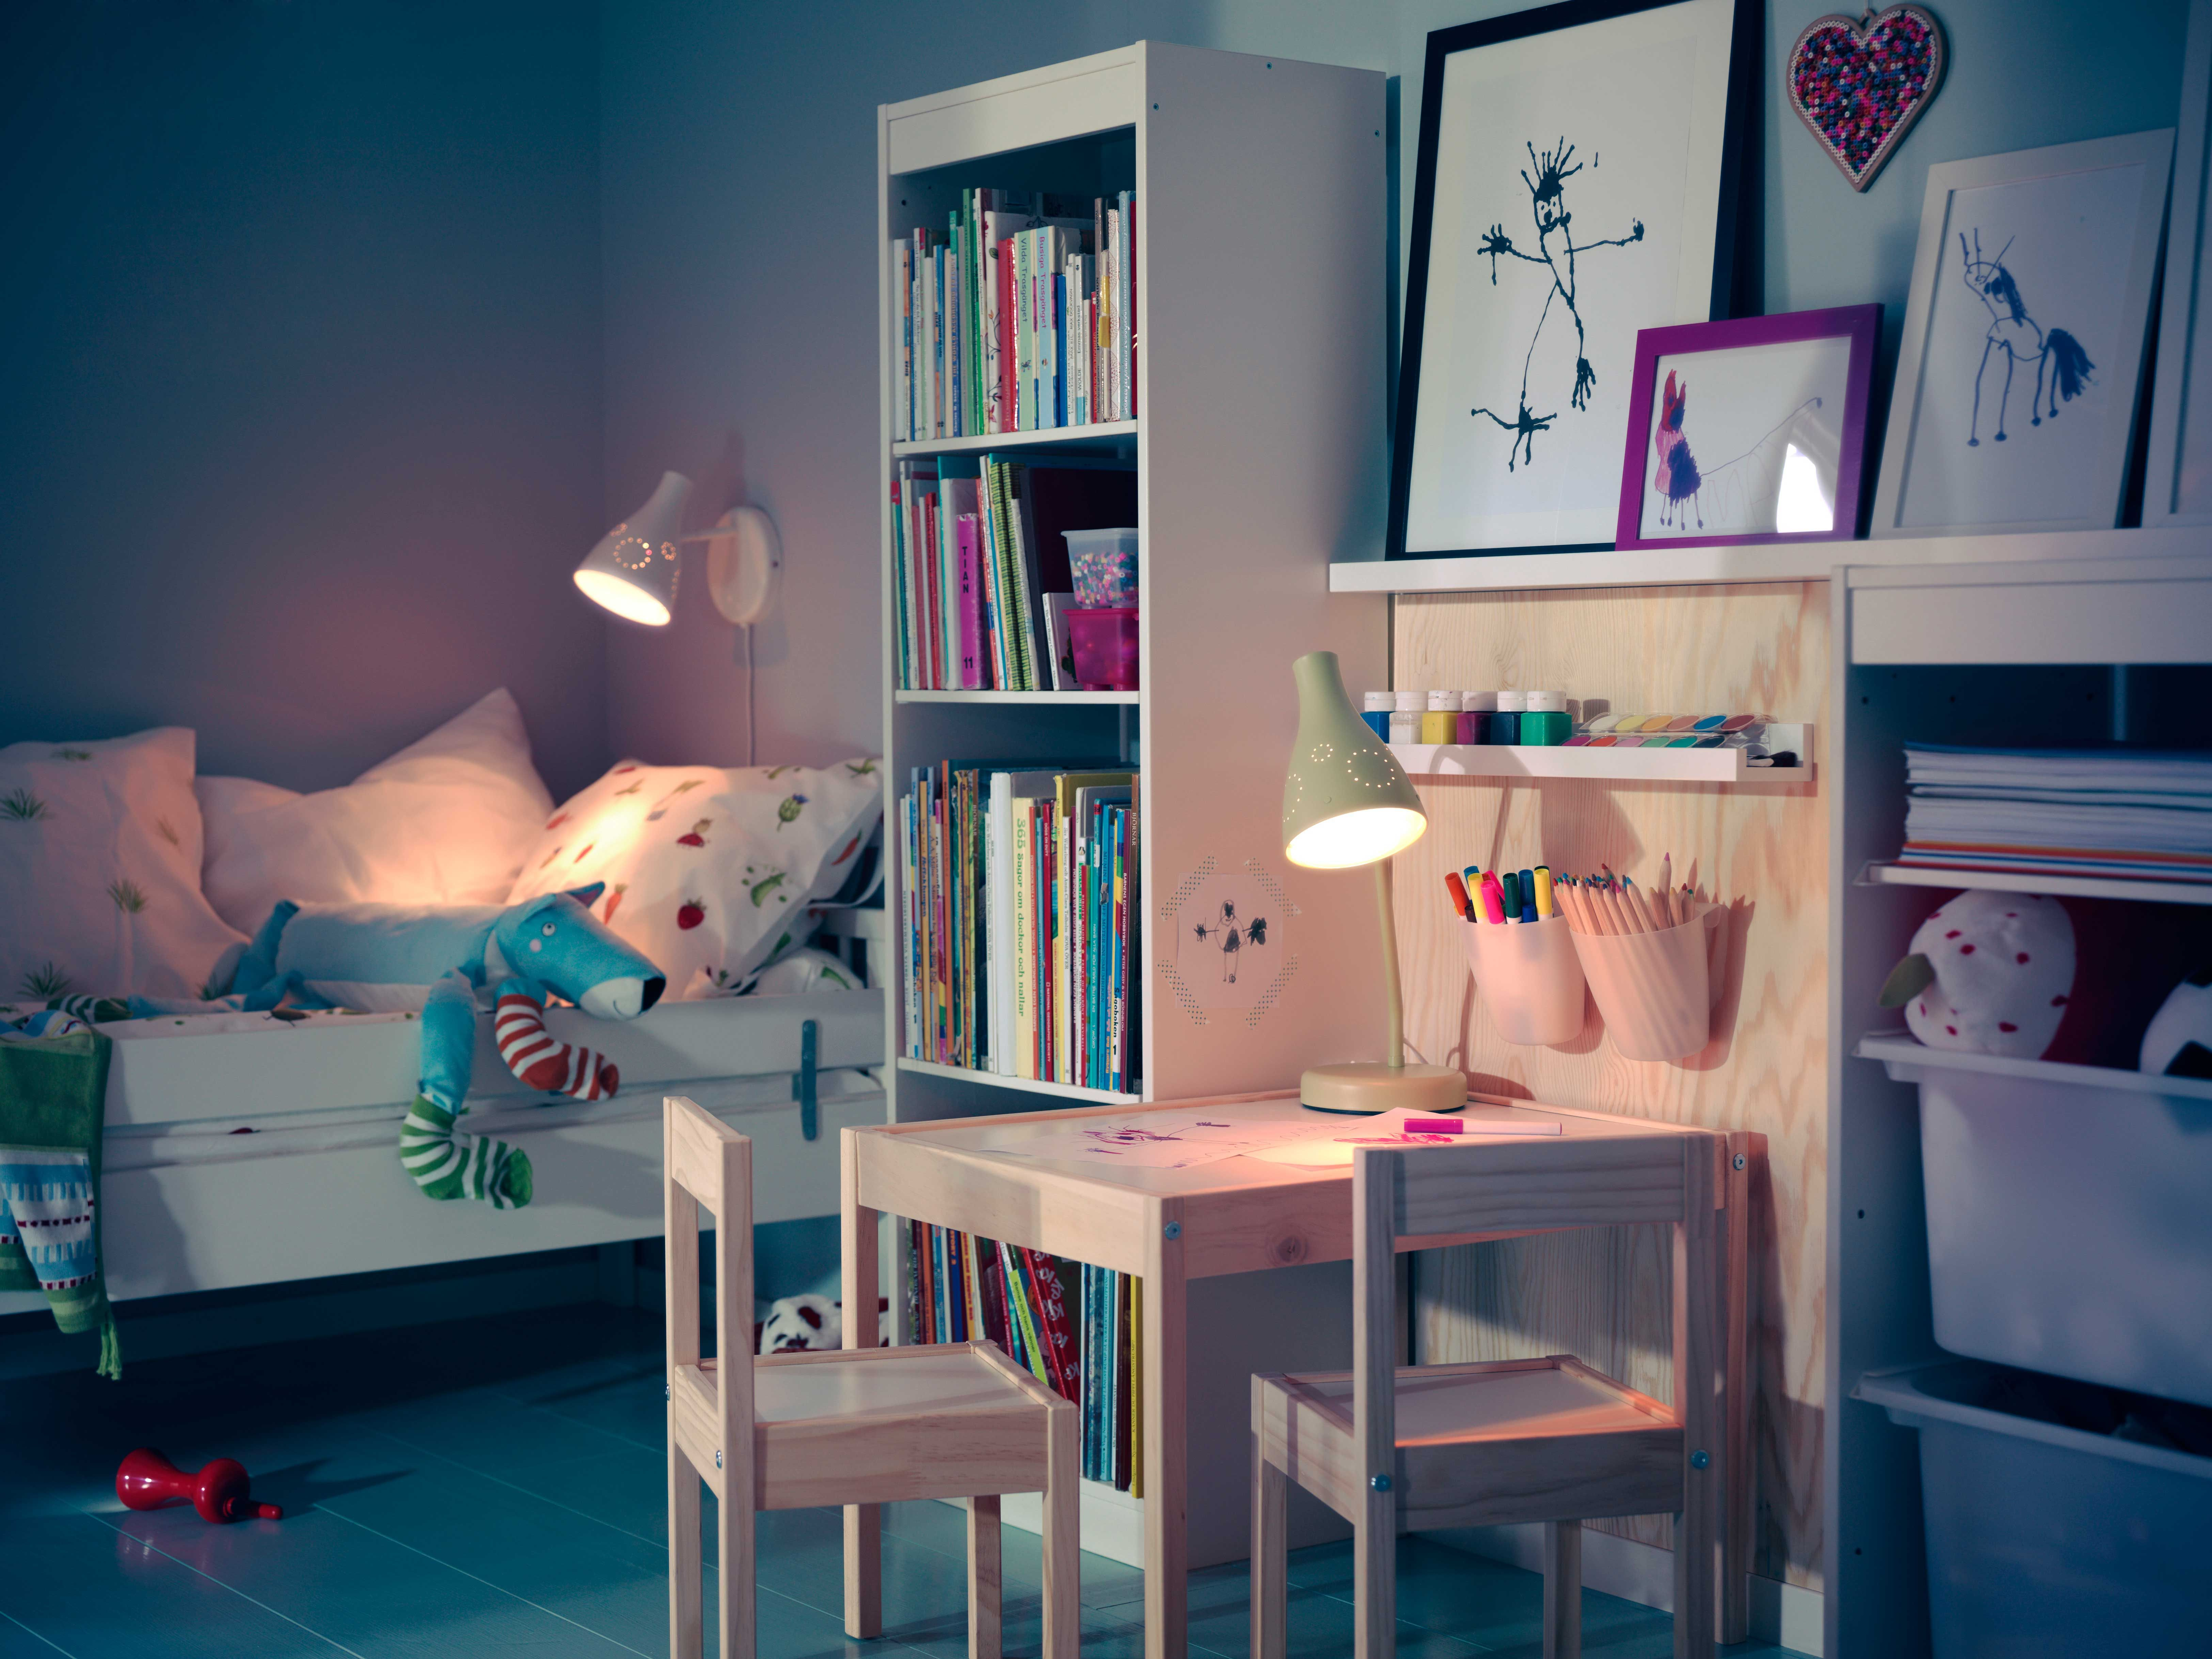 Ikea kinderzimmer inspiration  IKEA Österreich, Inspiration, Kinder, Kids, Kindermöbel ...